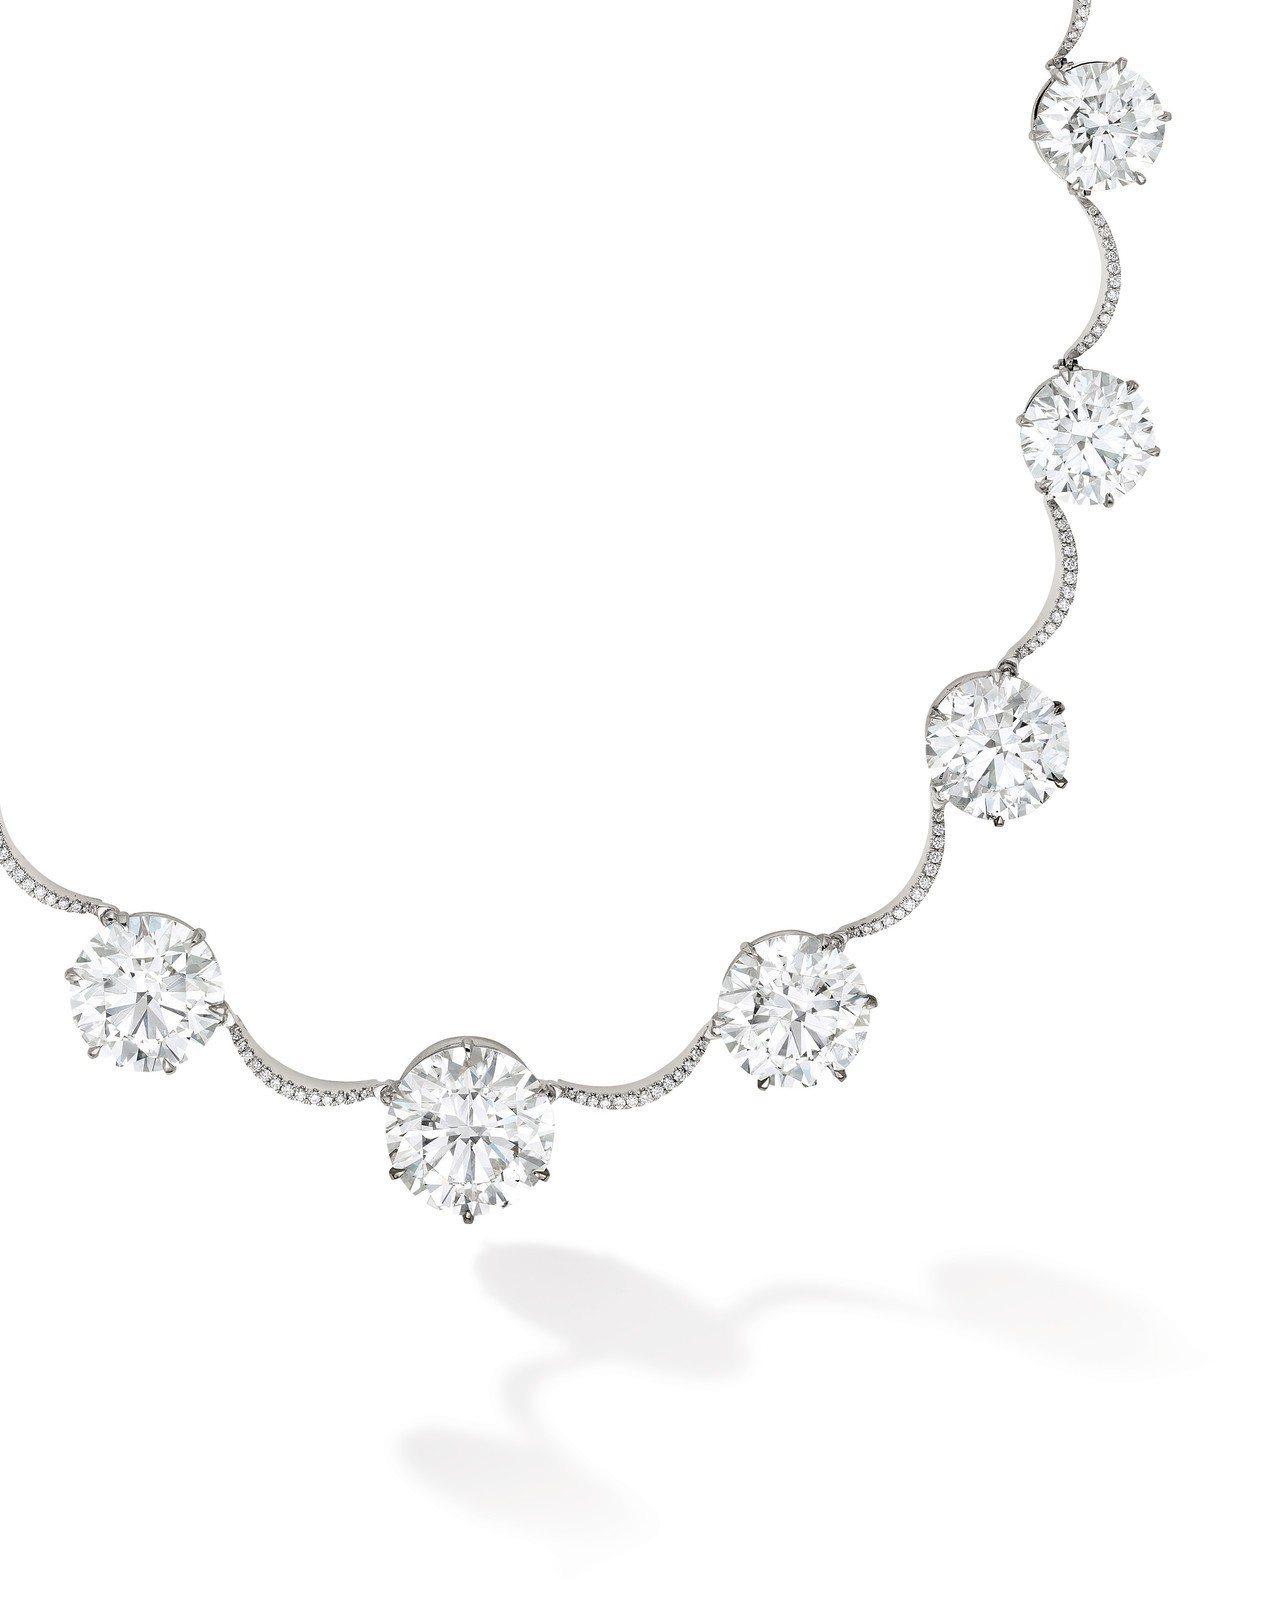 鑽石項鍊鑲嵌16枚triple excellent鑽石共 130.61 克拉,估...